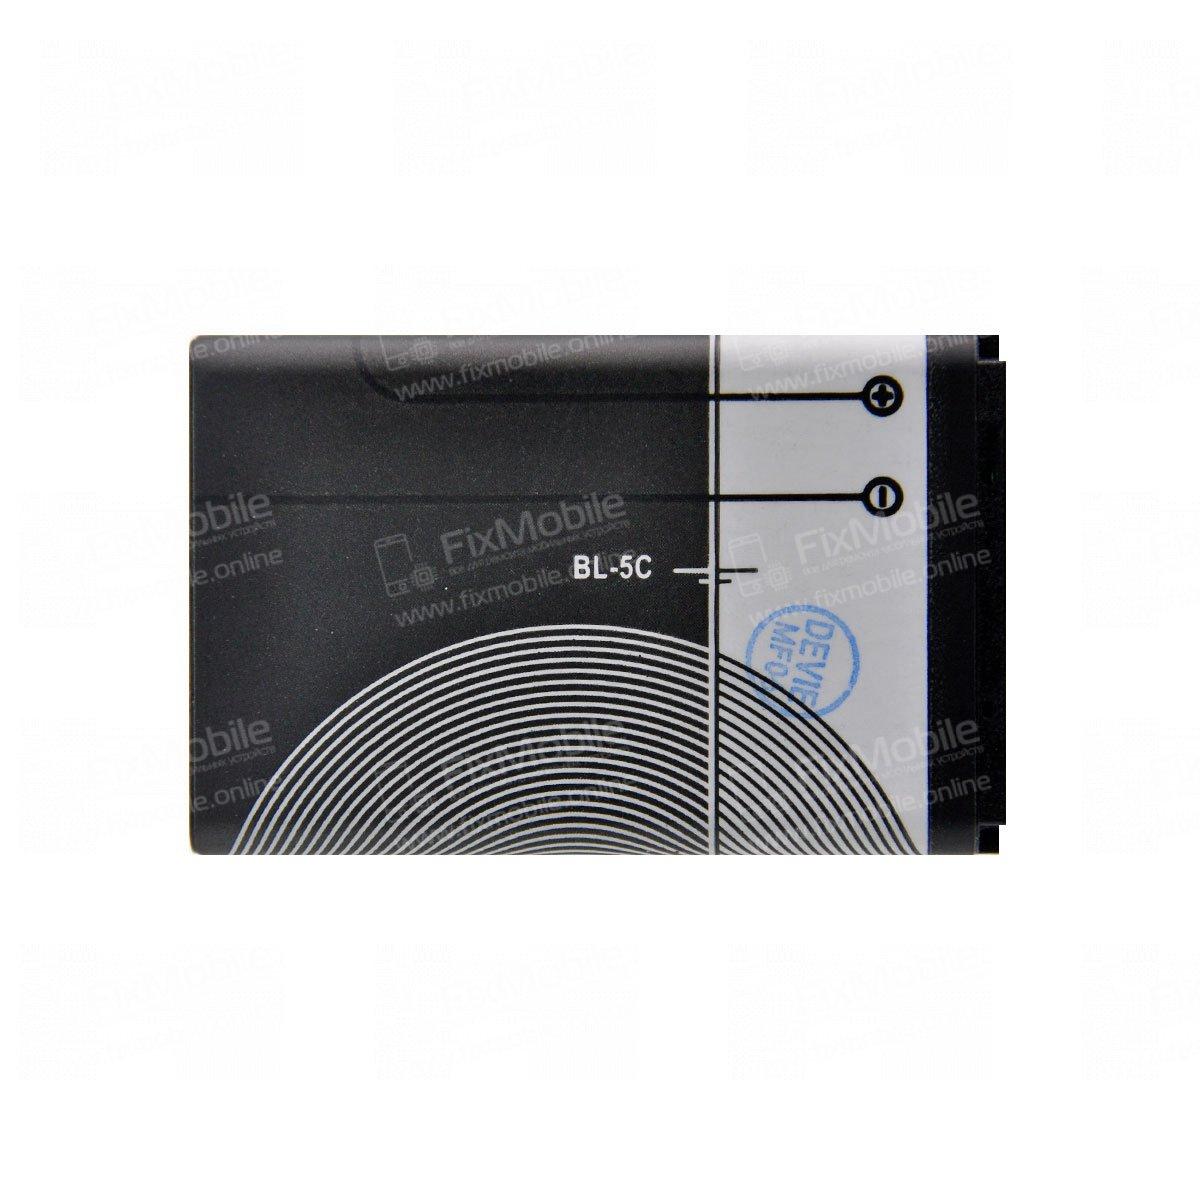 Аккумуляторная батарея для Nokia 1100 BL-5C